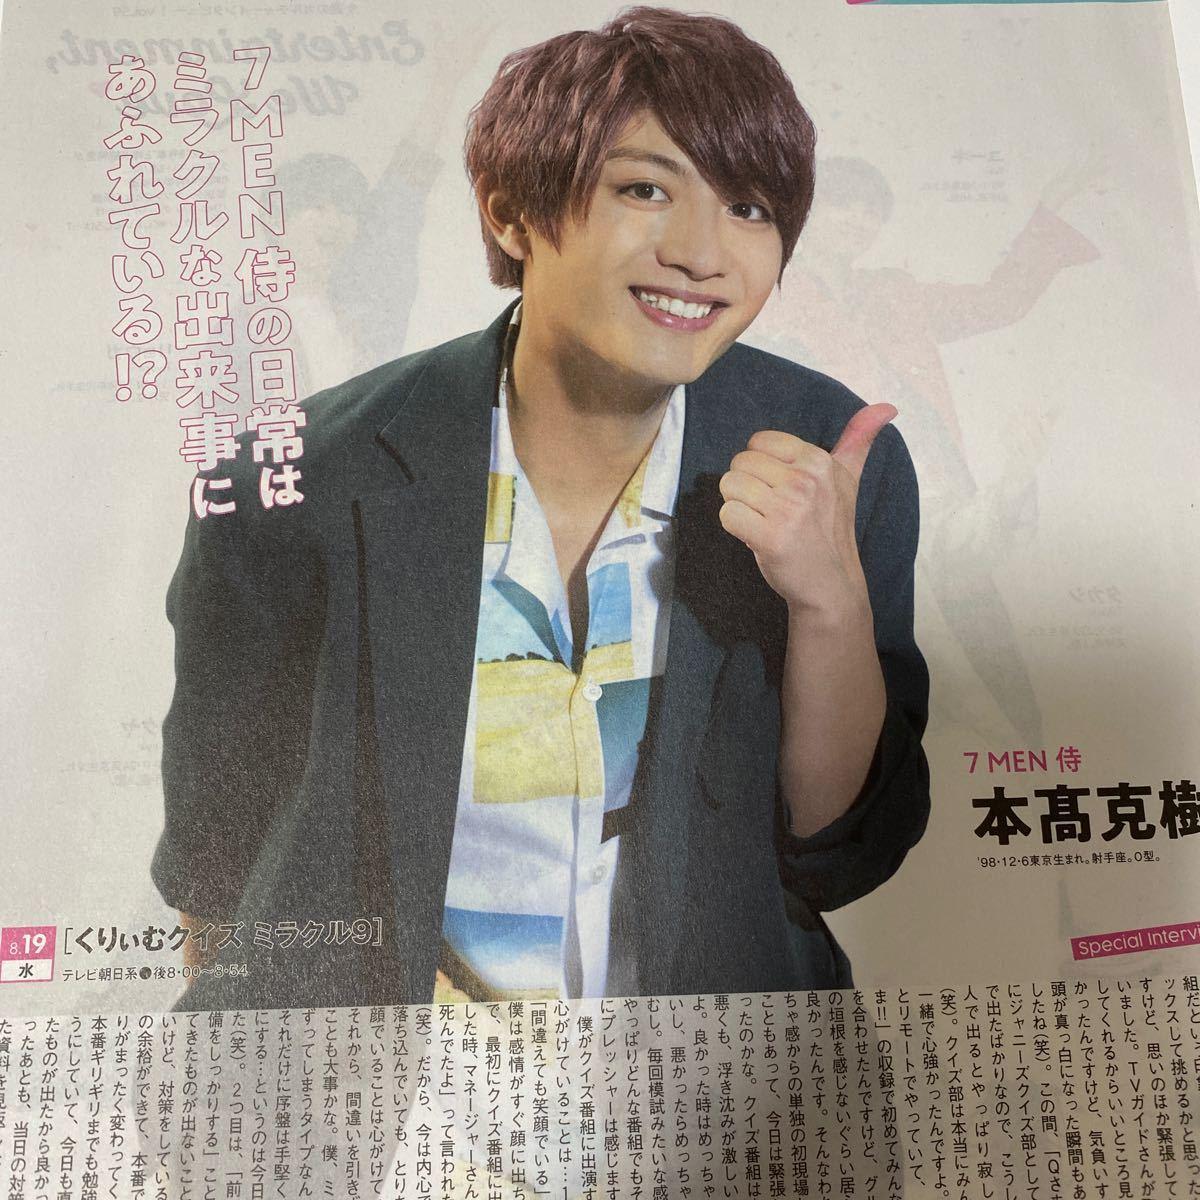 TVガイド 2020/8/14 本高克樹